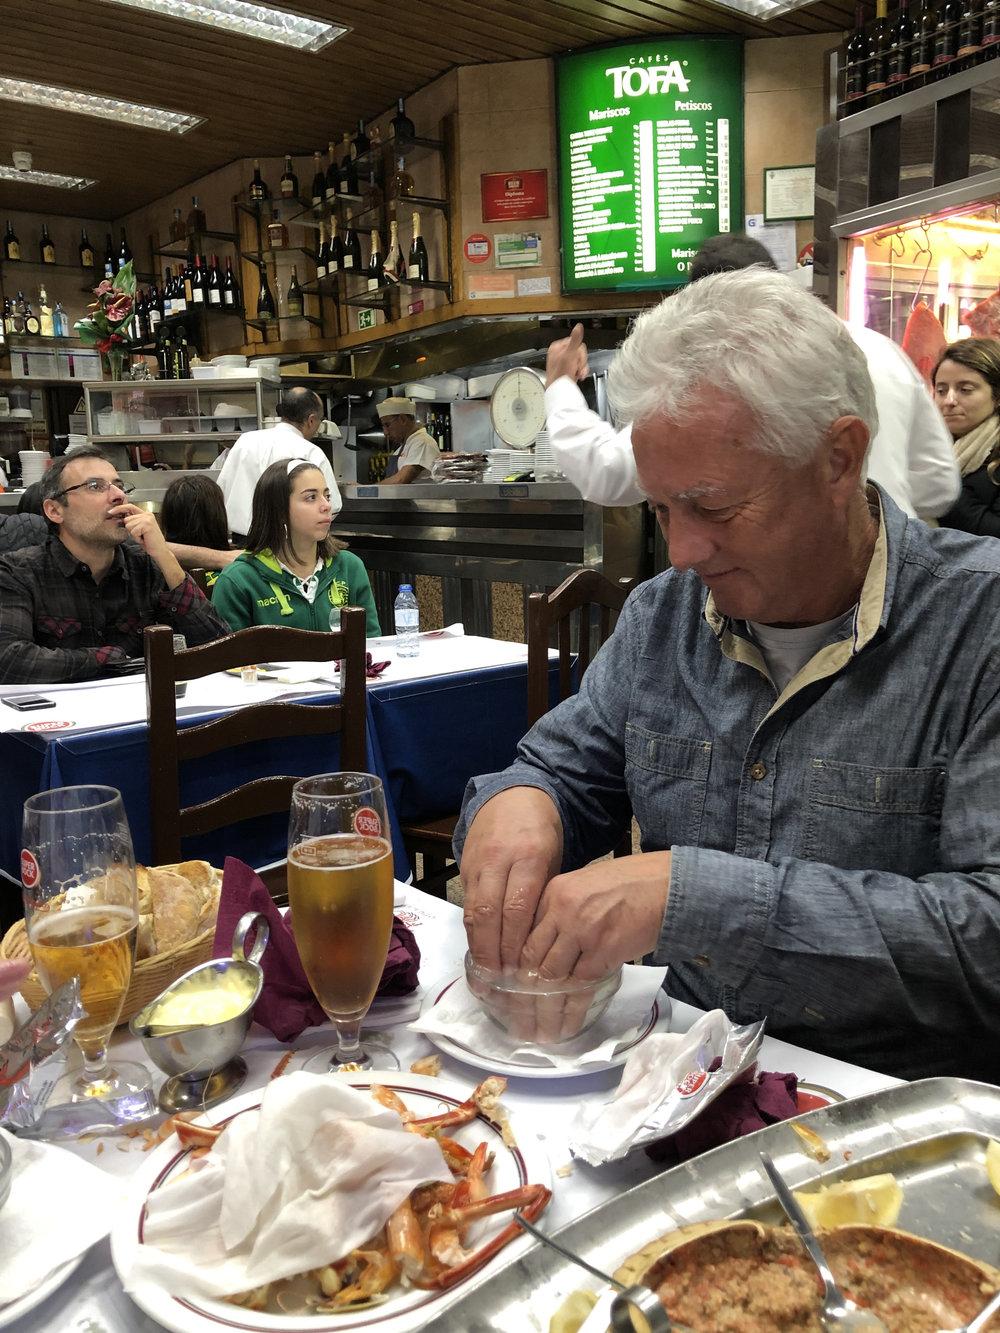 teri_lisbon_portugal_OPalacio_spiritedtable_photo02.jpg